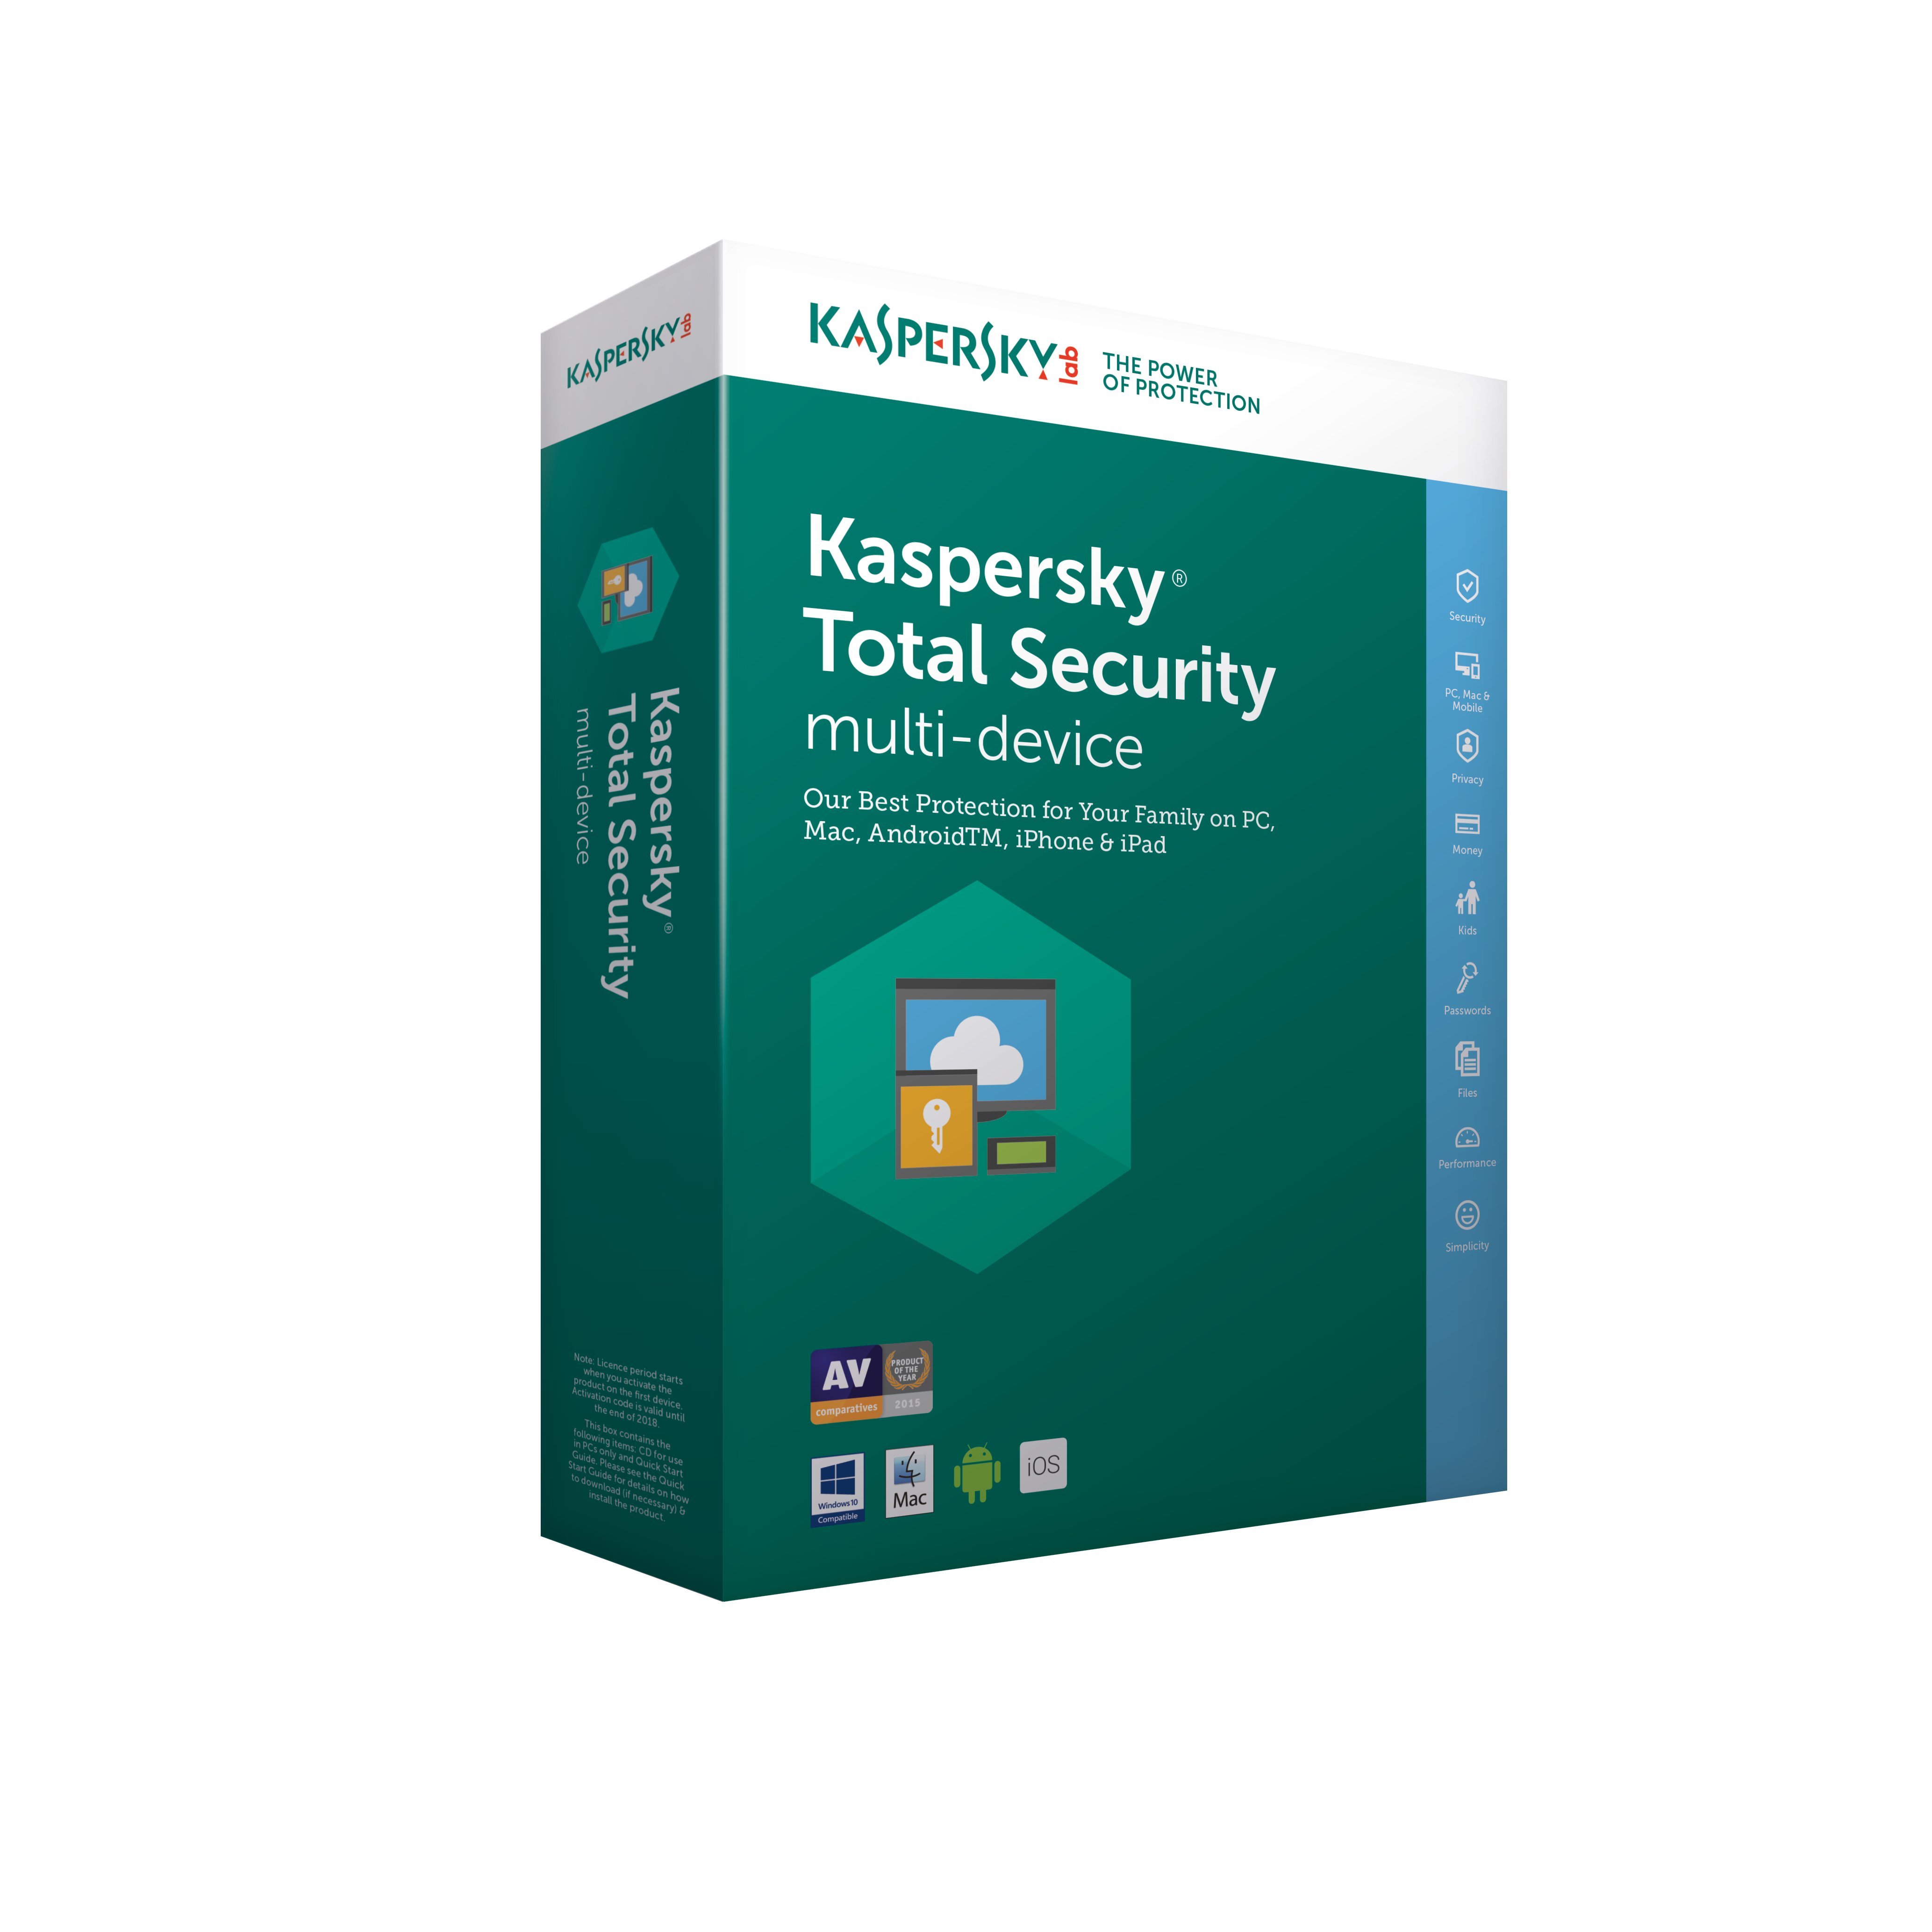 Kaspersky Total Security MD 2018 CZ, 2x, 2 roky